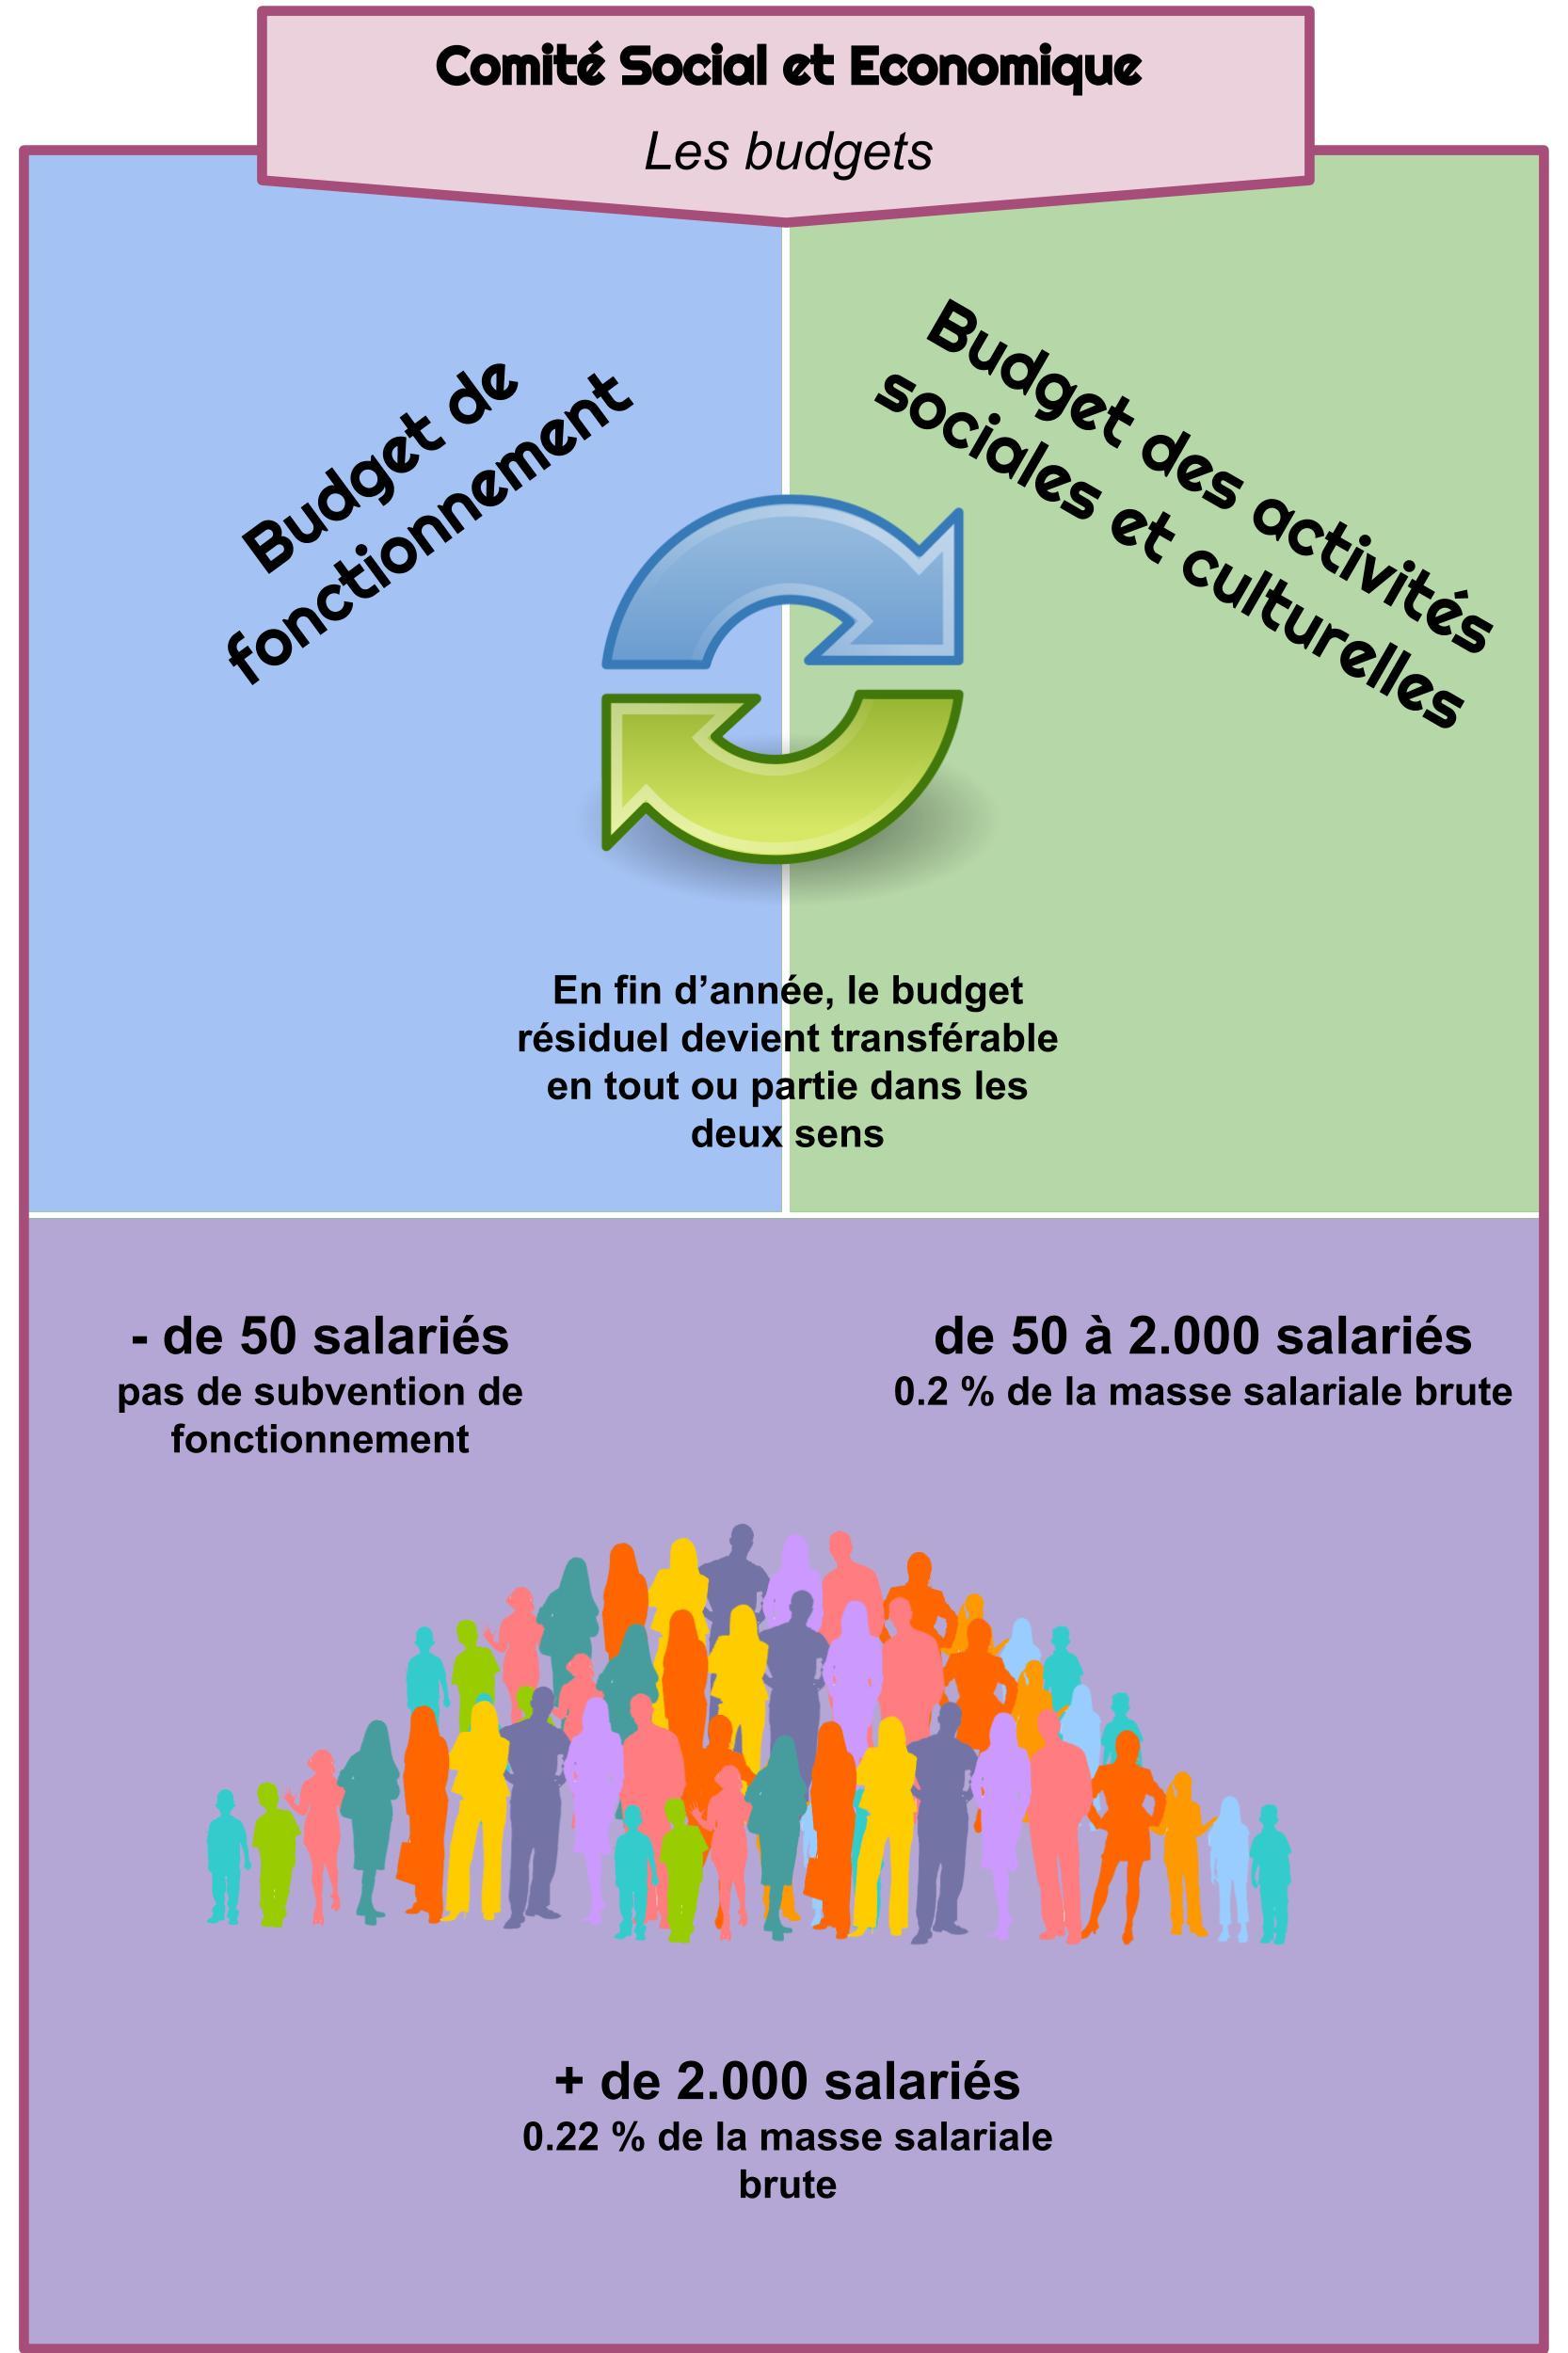 CSE - Les budgets